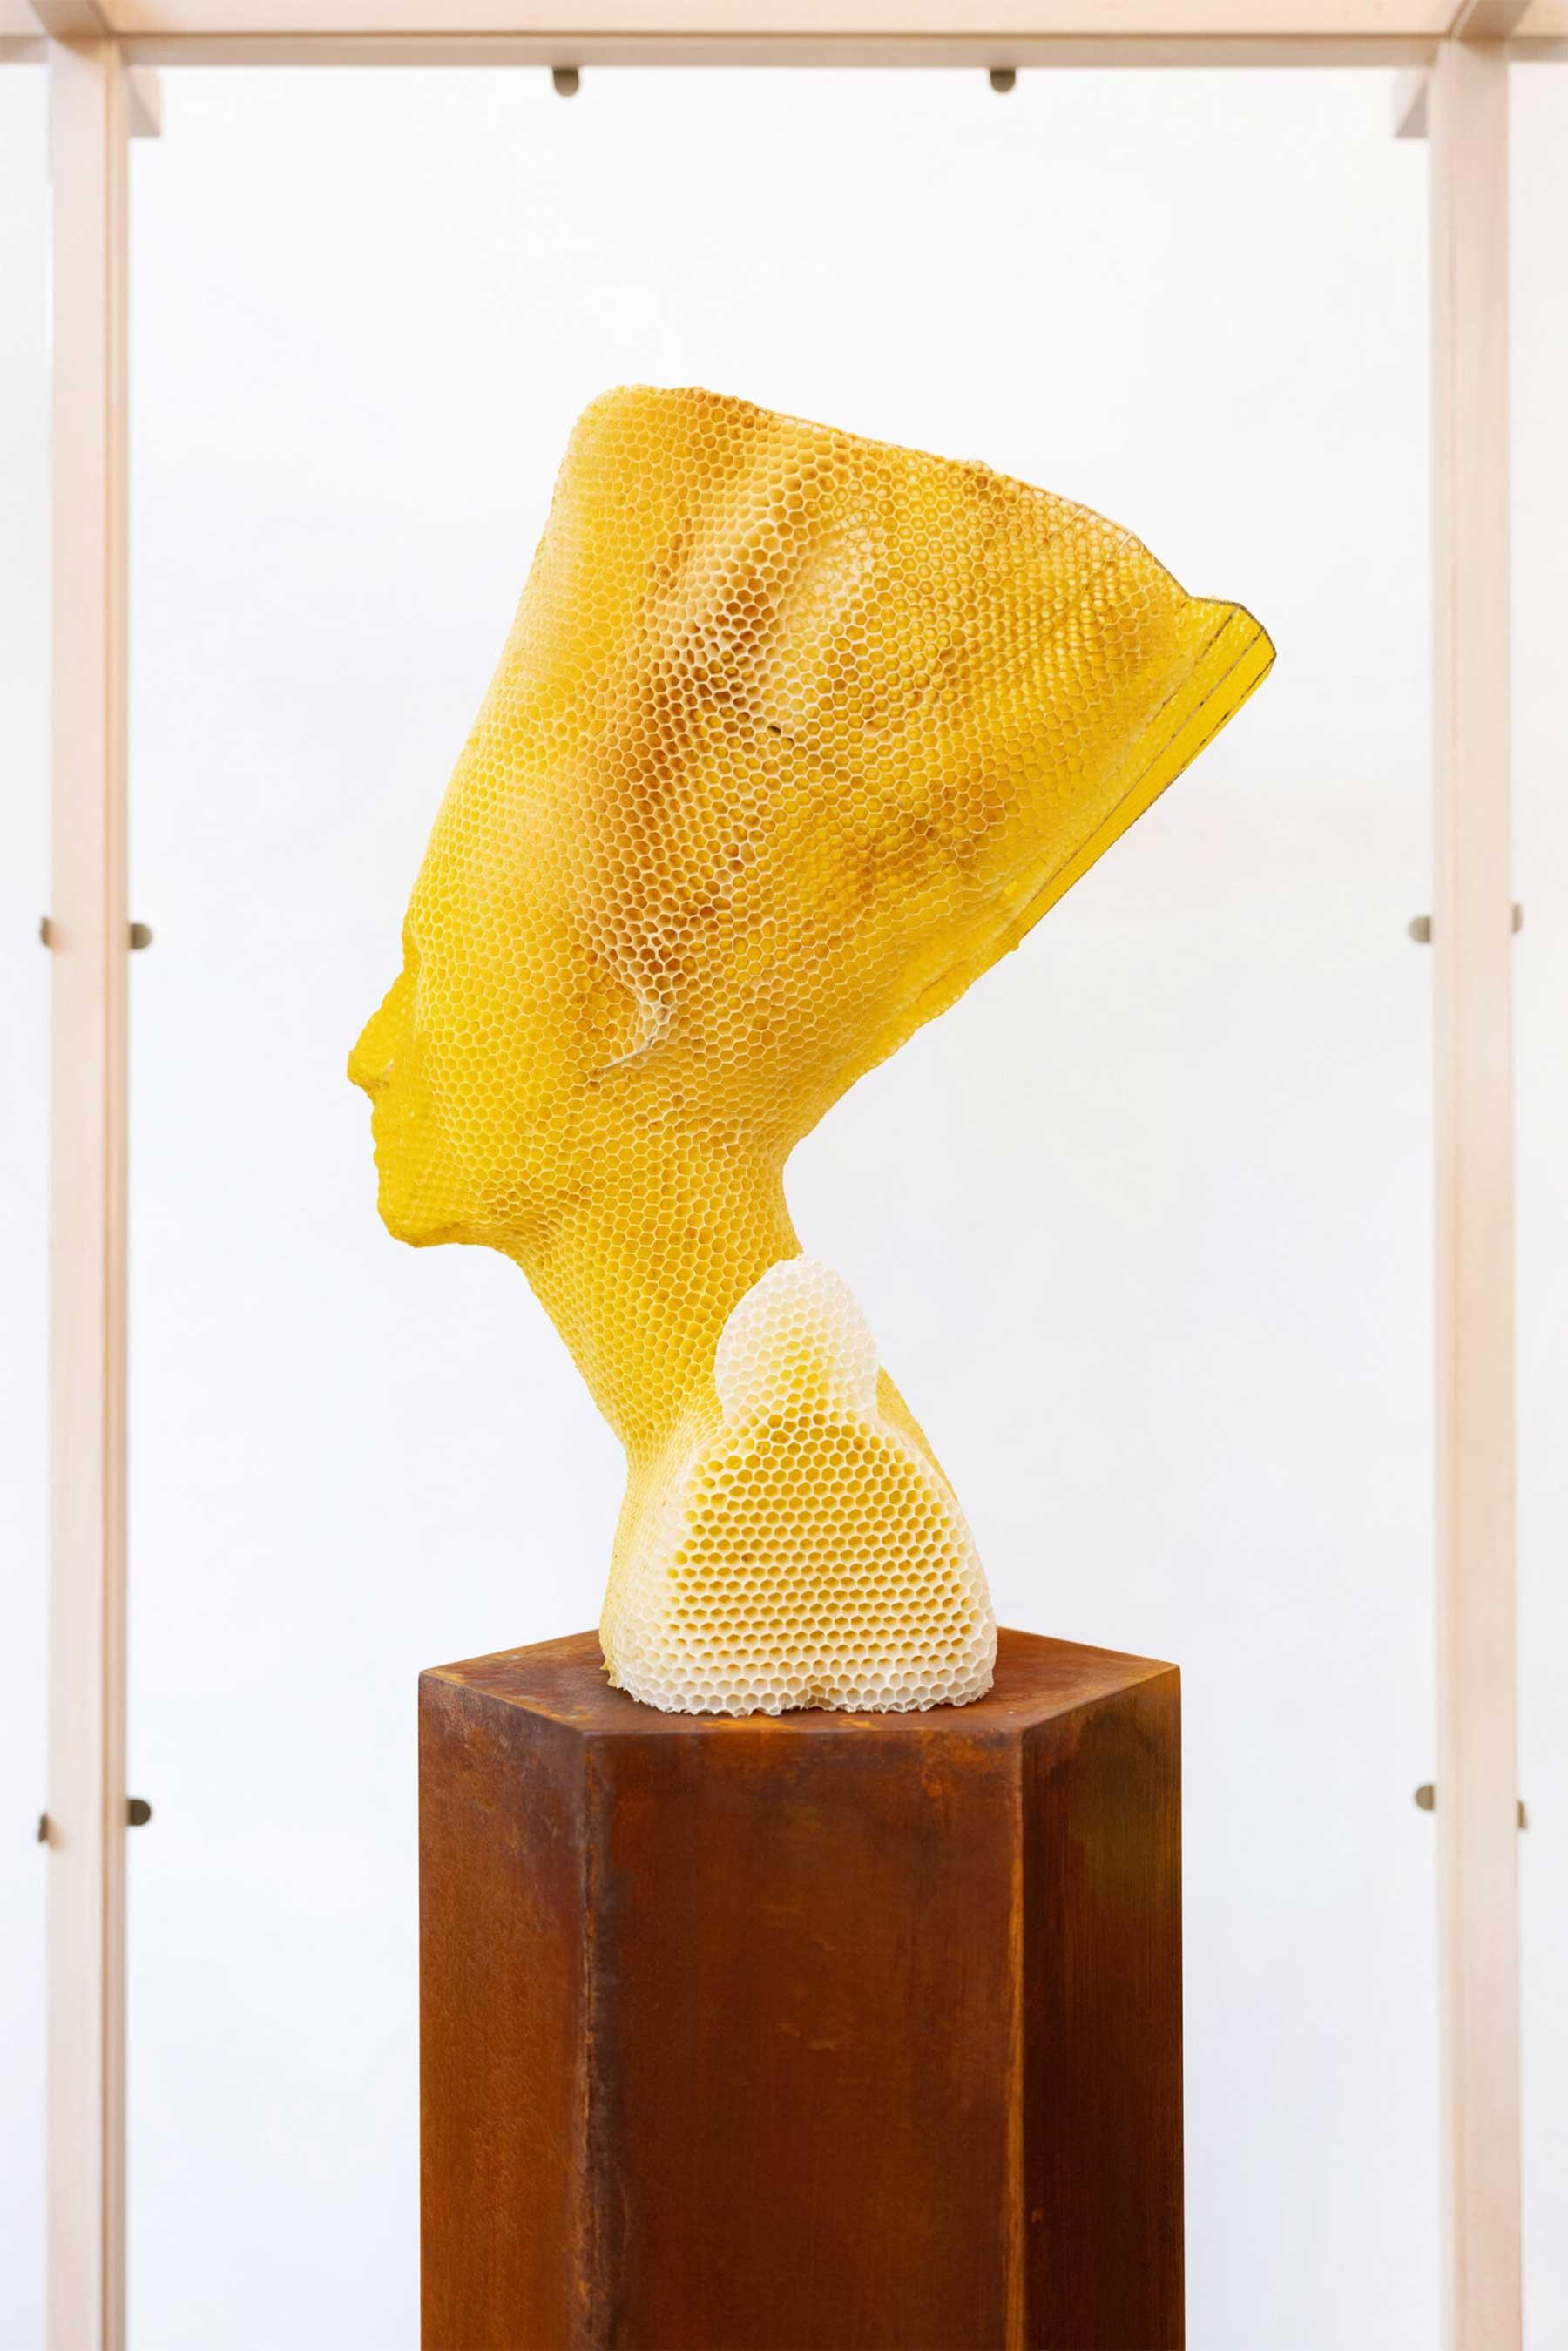 Bienenwachs-Skulpturen von Tomáš Libertíny Tomas-Libertiny-Bienenwachs-skulpturen_03